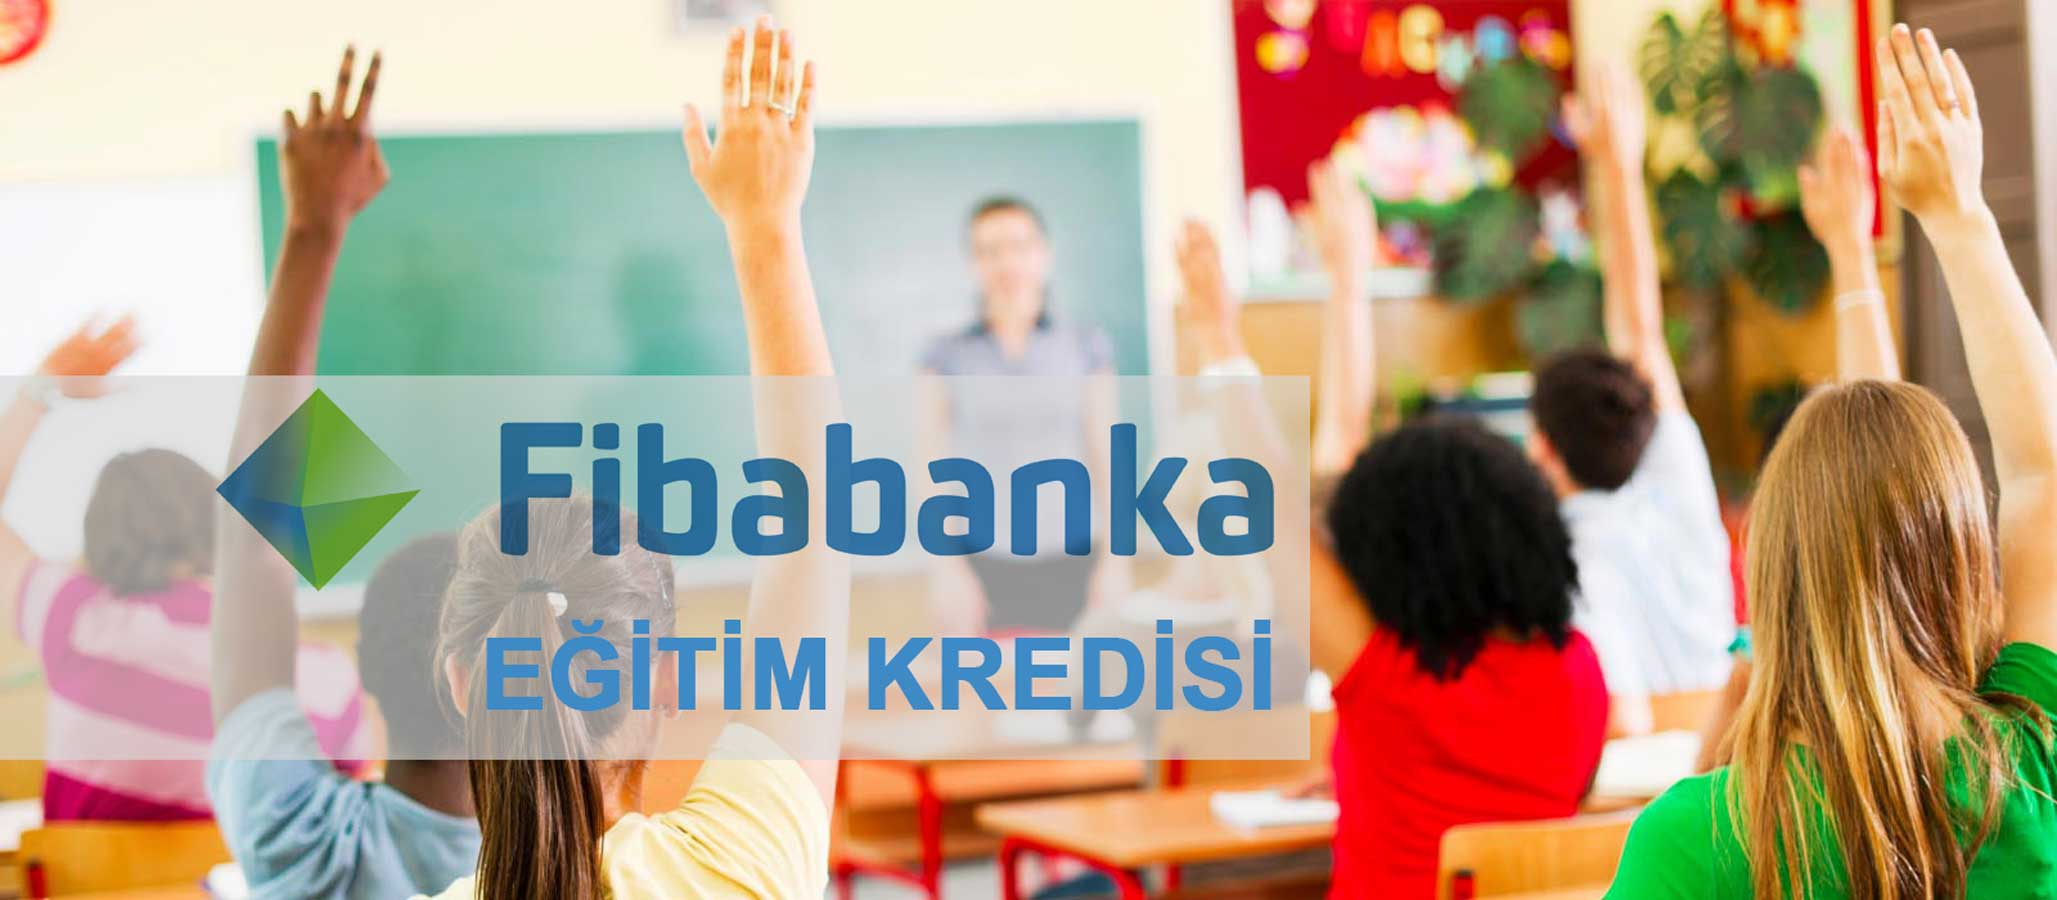 Fibabanka Eğitim Kredisi